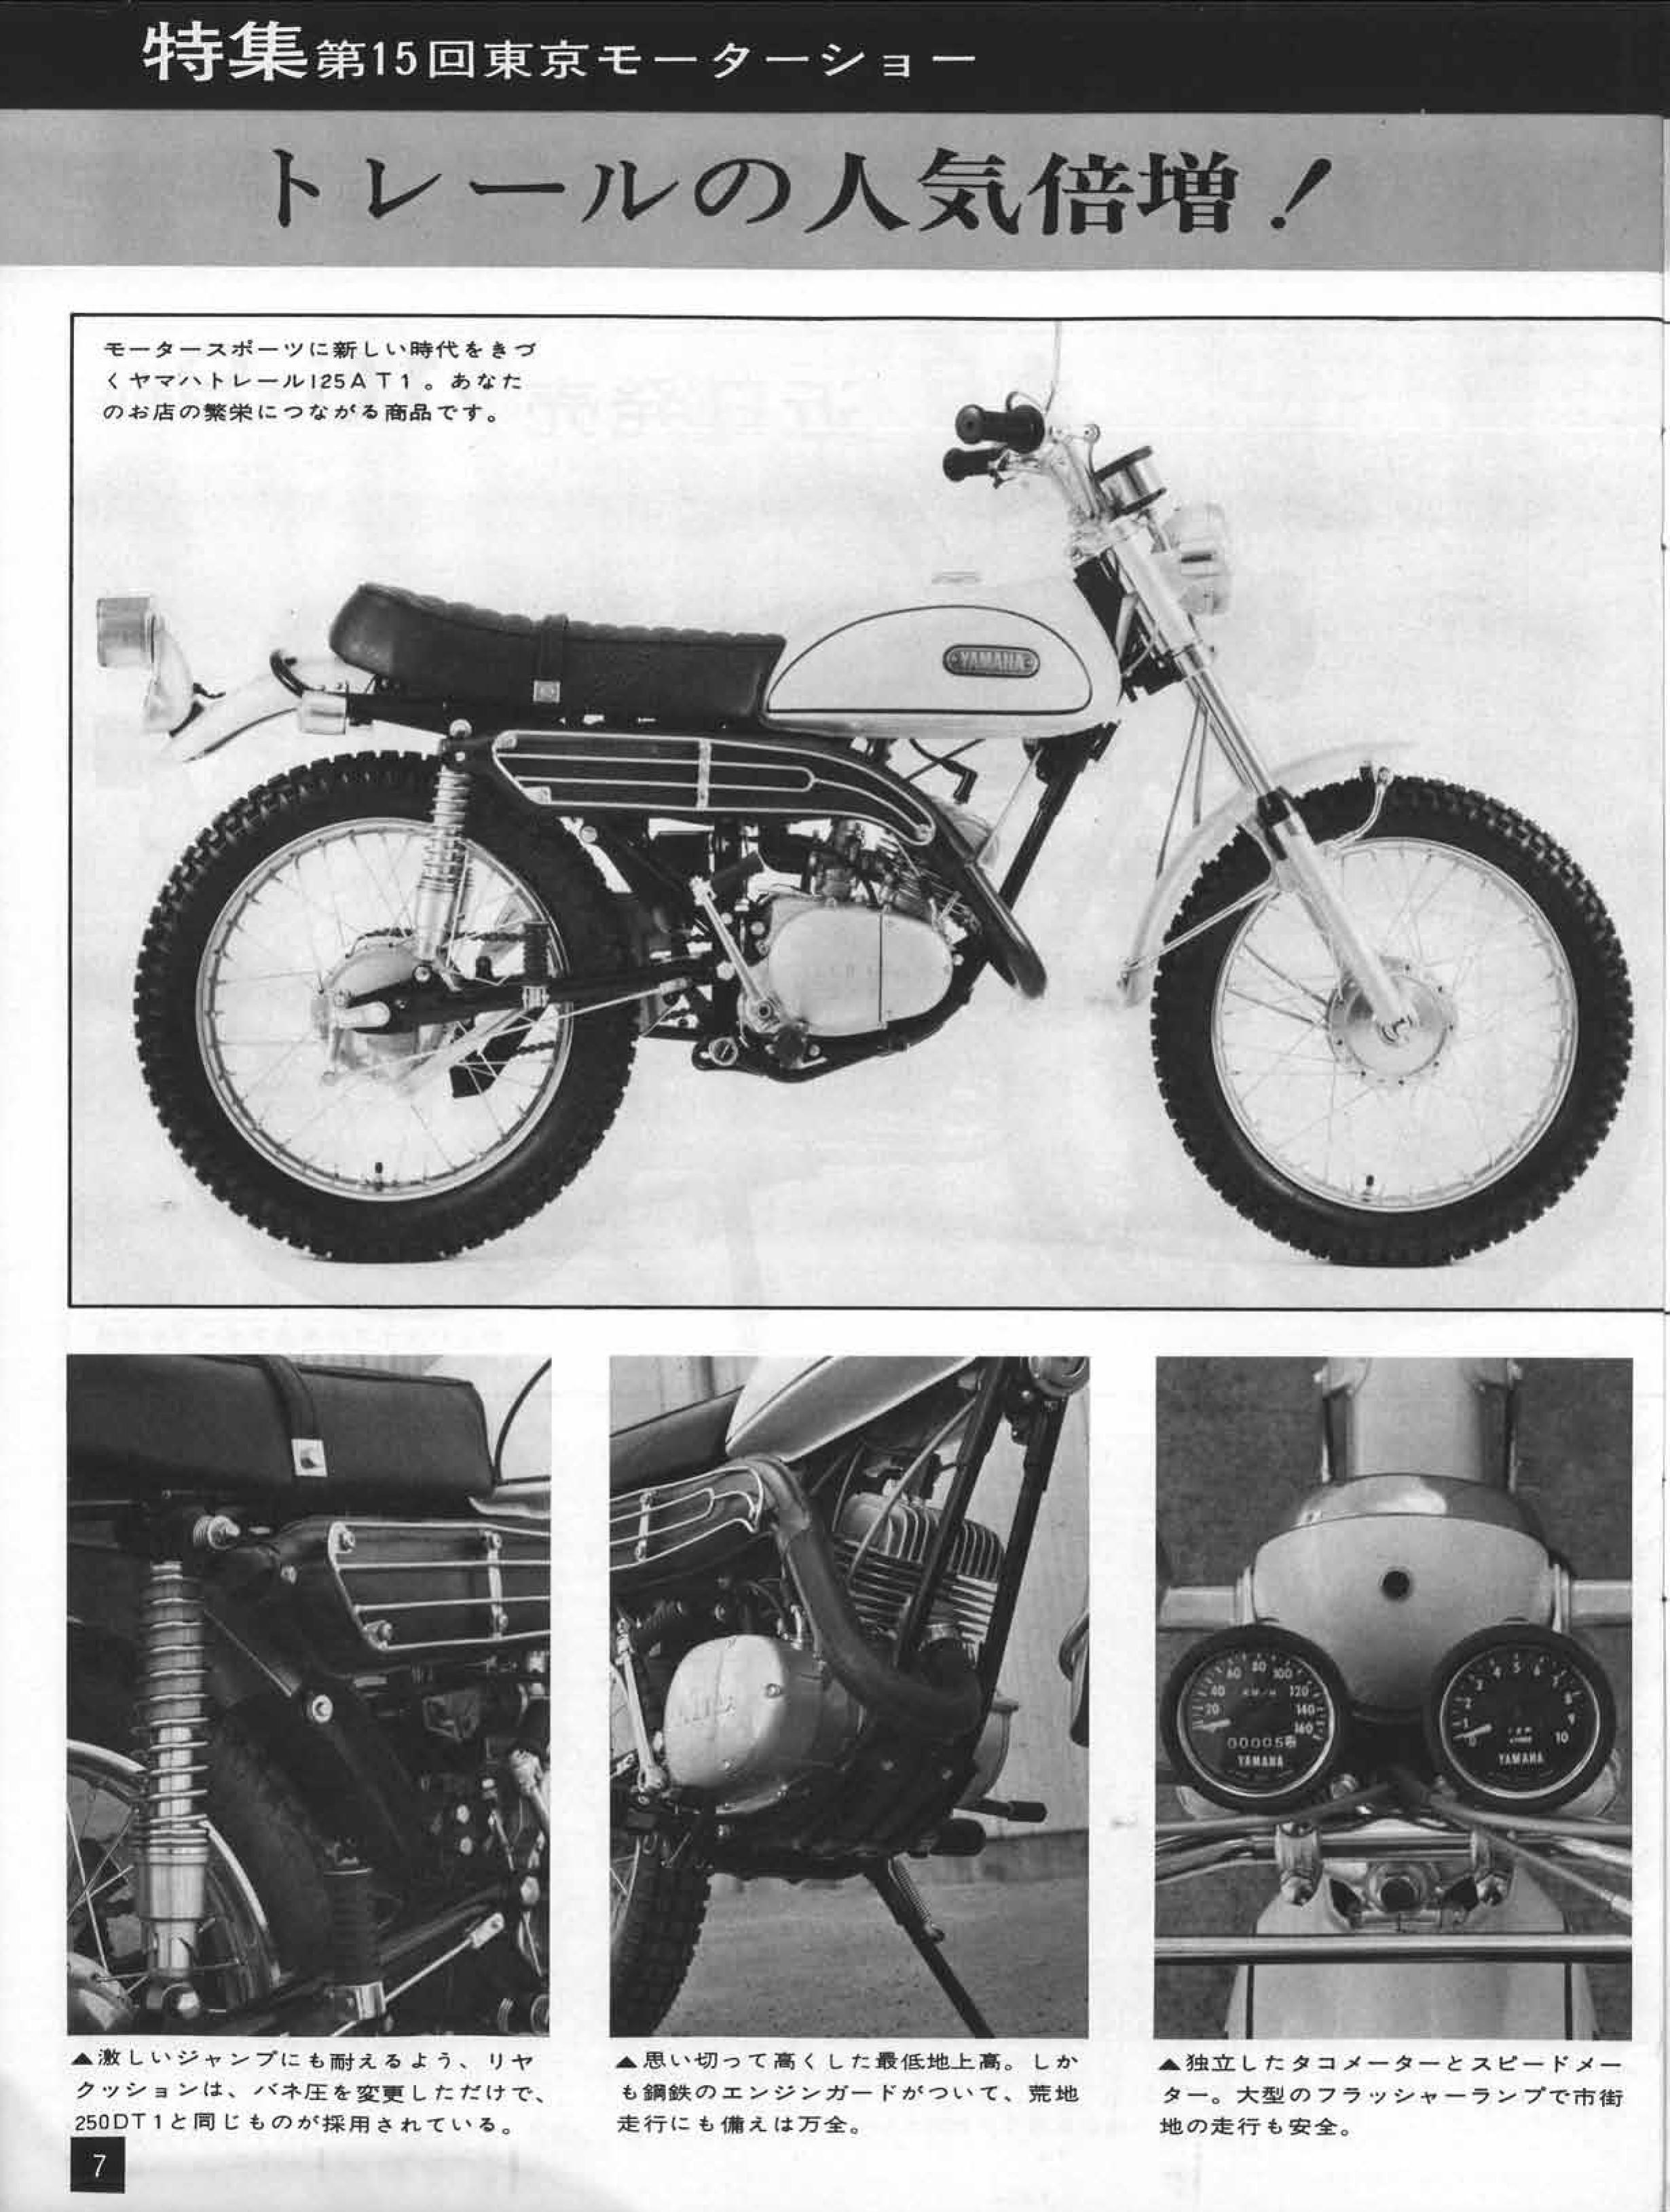 MOTOM 121 2_pdfs11